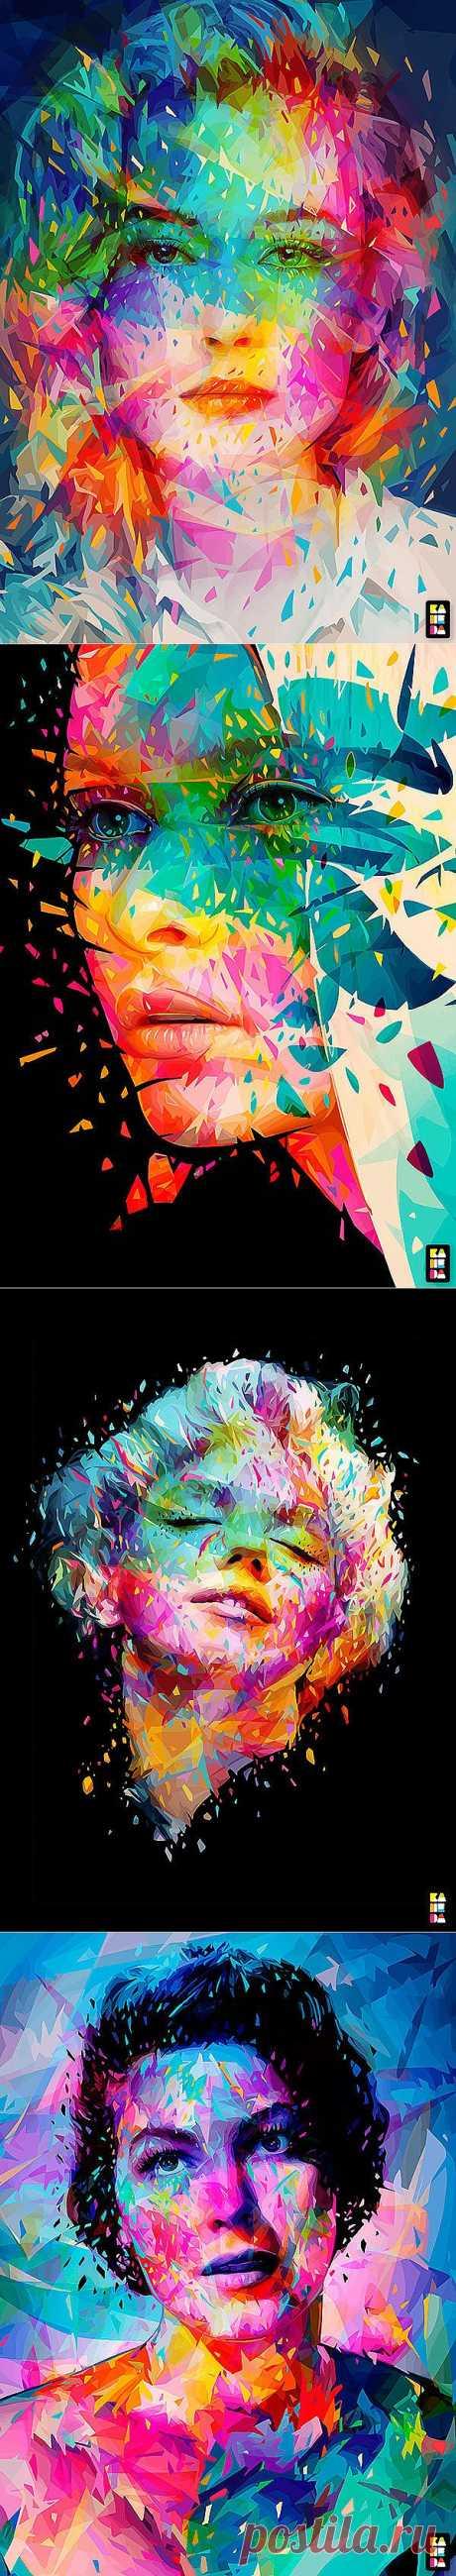 Различные иллюстрации 2013 Алессандро Pautasso | InspireFirst